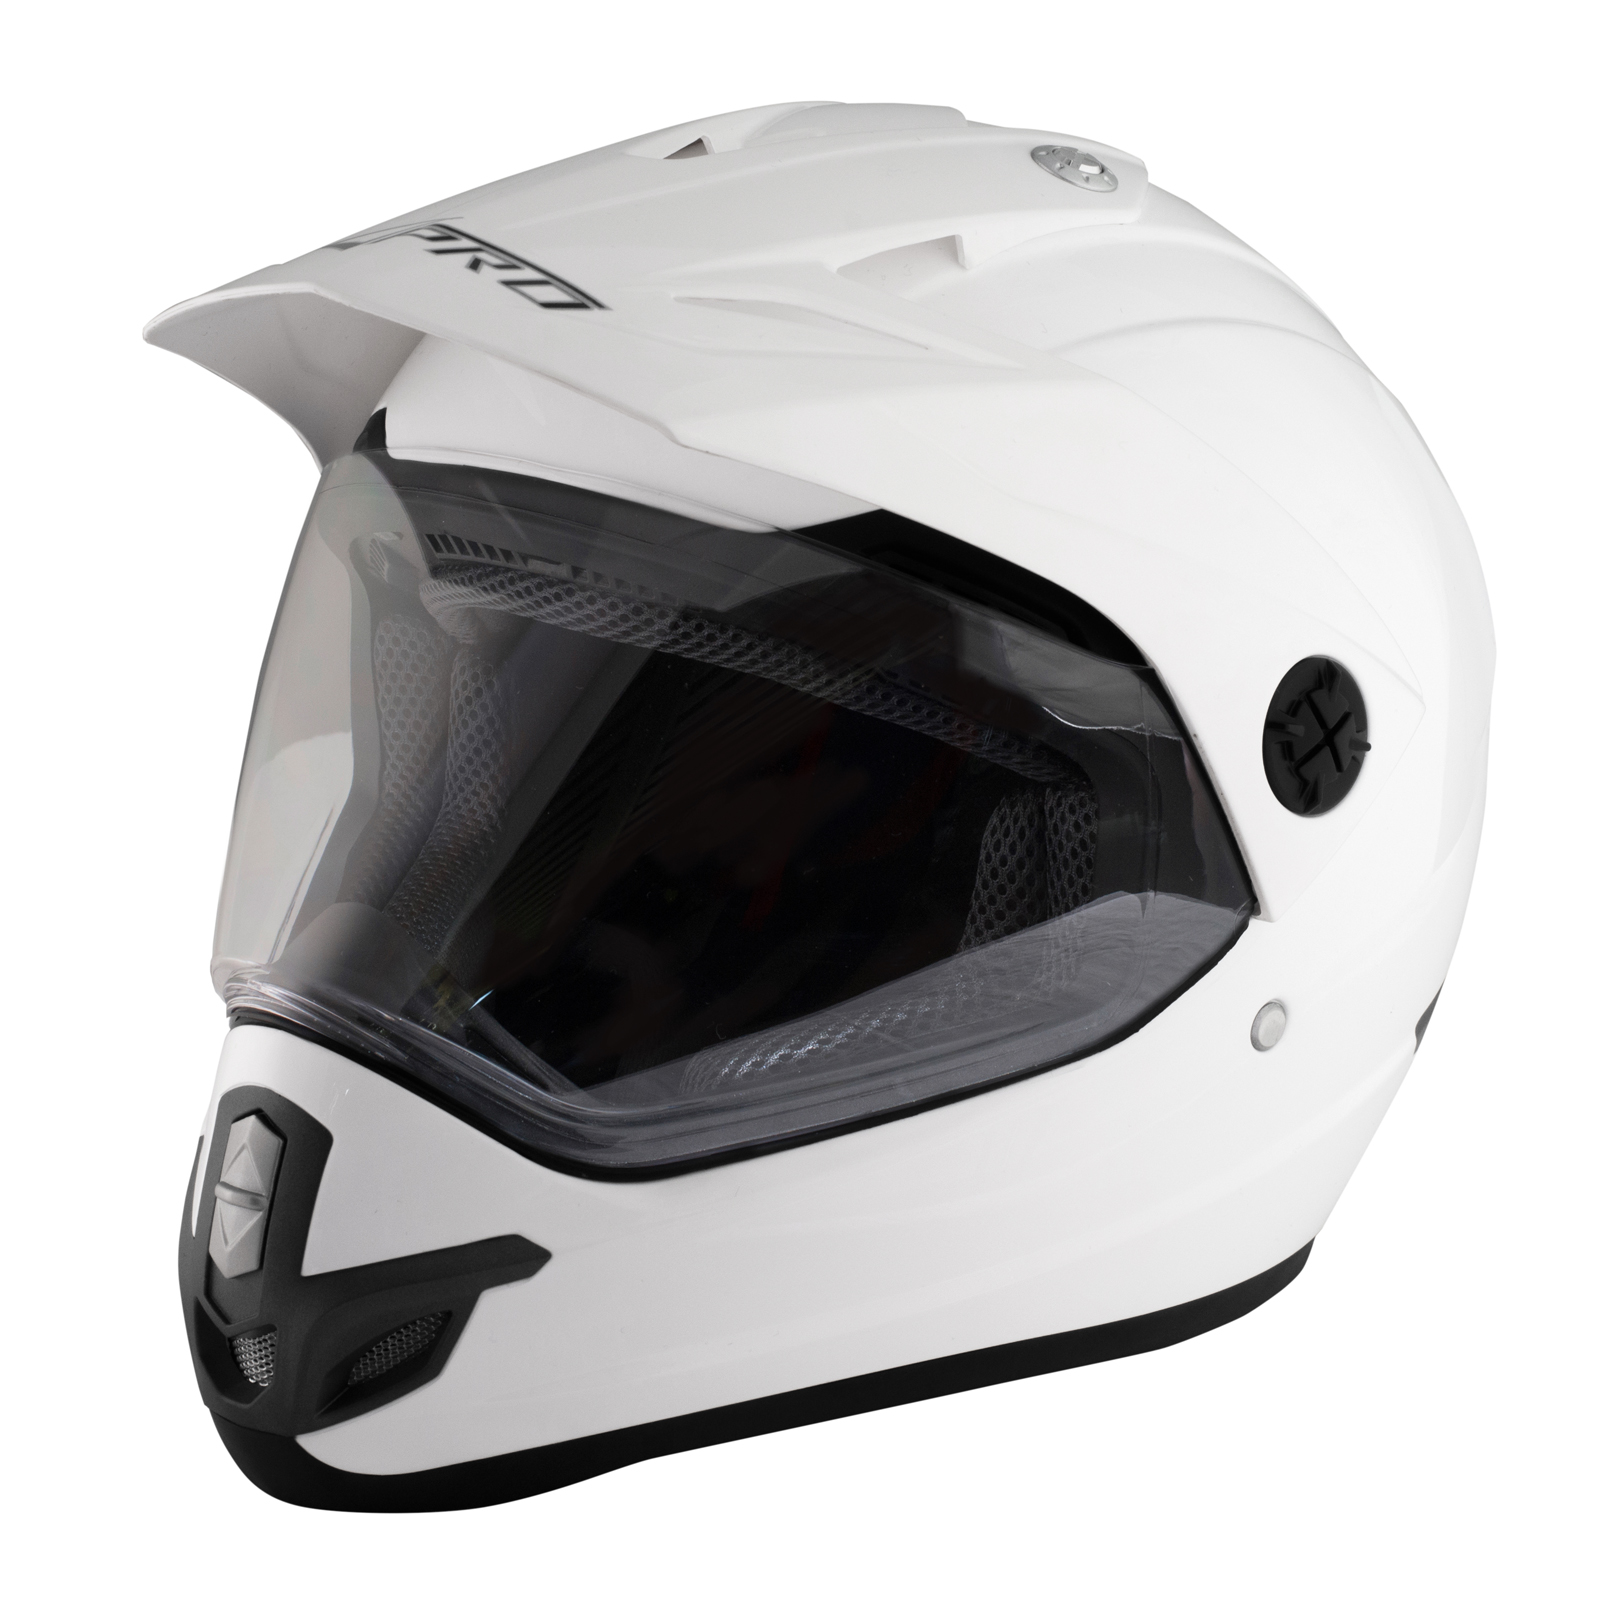 casque motocross moto enduro offroad quad atv visi re anti bu e blanc ebay. Black Bedroom Furniture Sets. Home Design Ideas